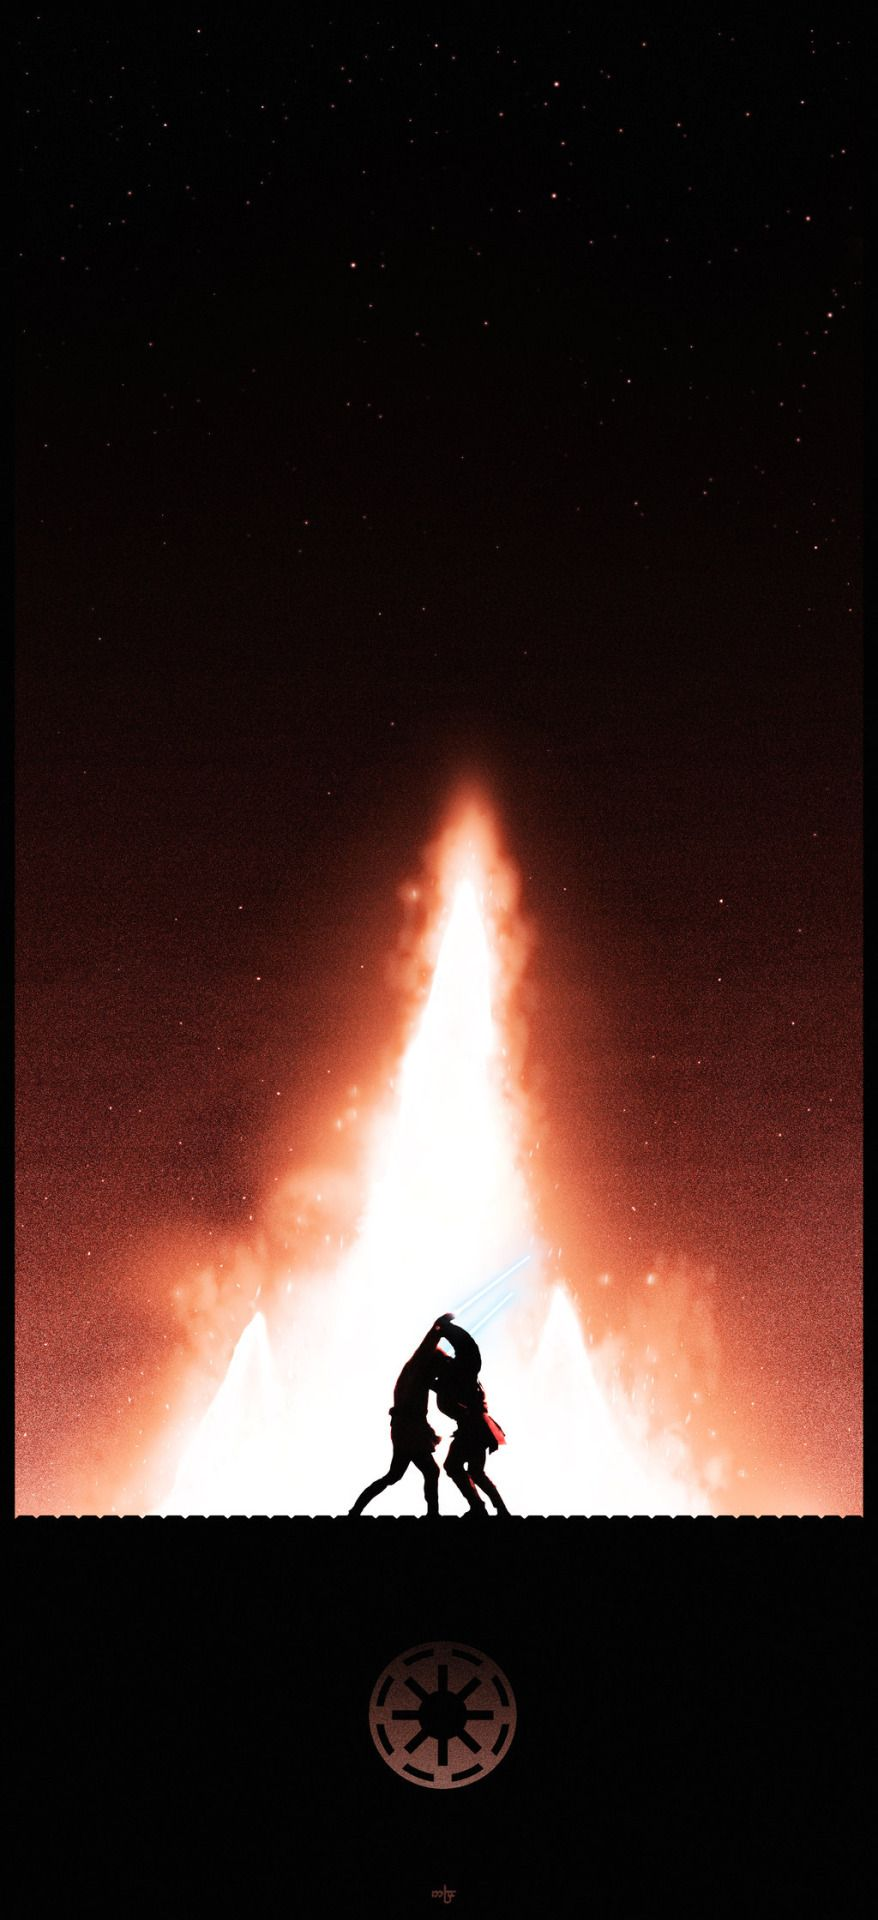 Manof2moro Star Wars Anakin Star Wars Poster Star Wars Poster Art